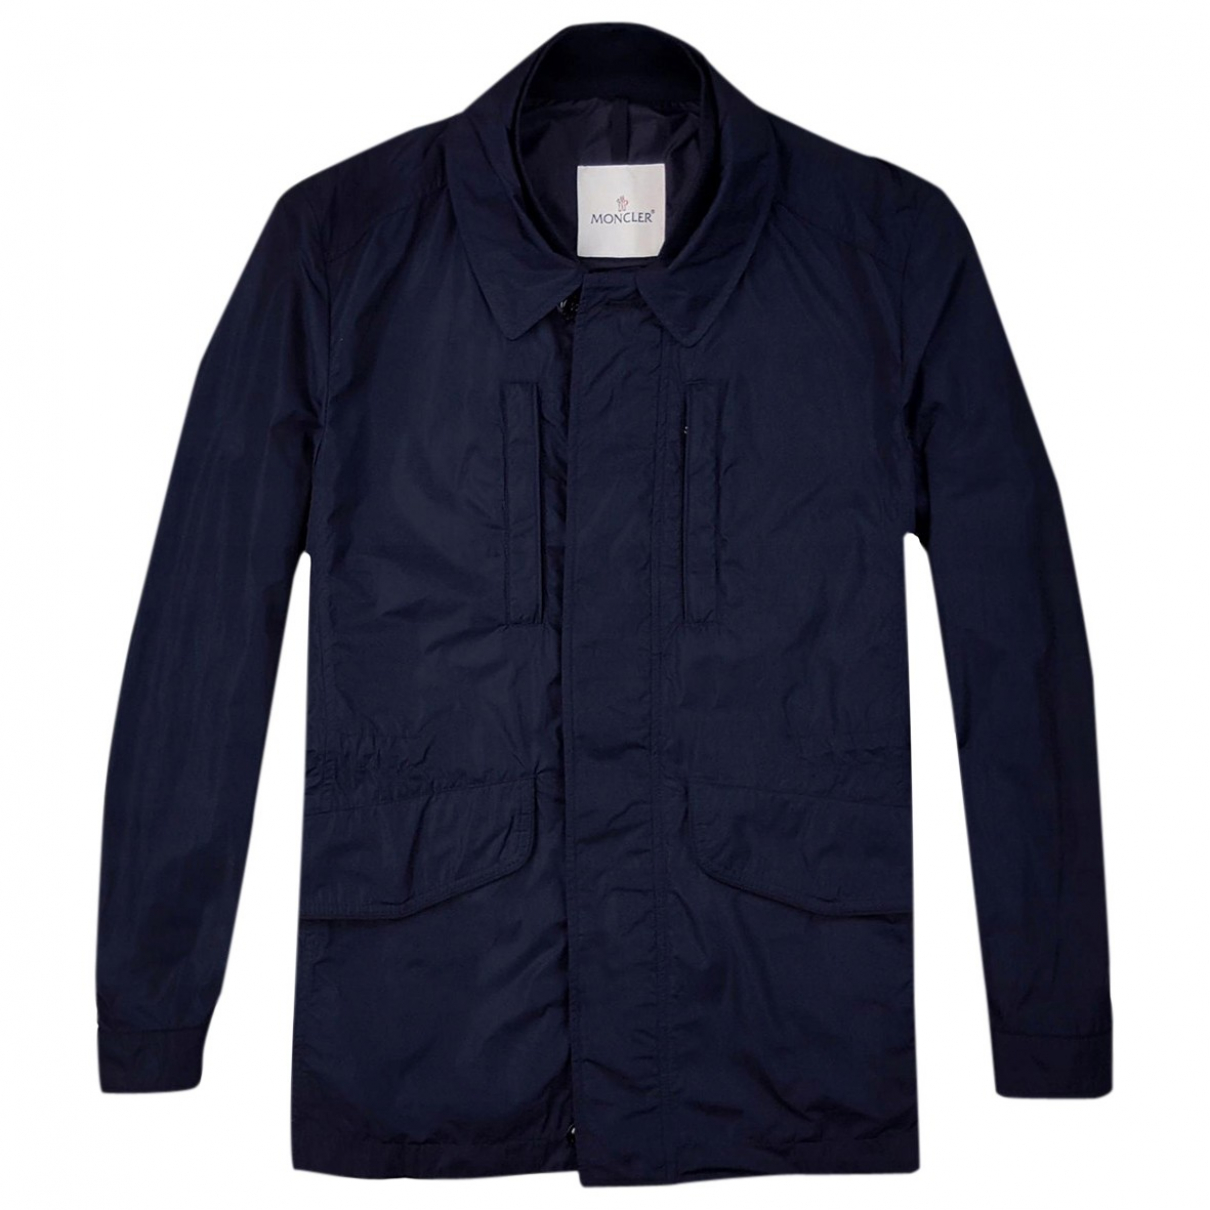 Moncler \N Jacke in  Marine Polyester